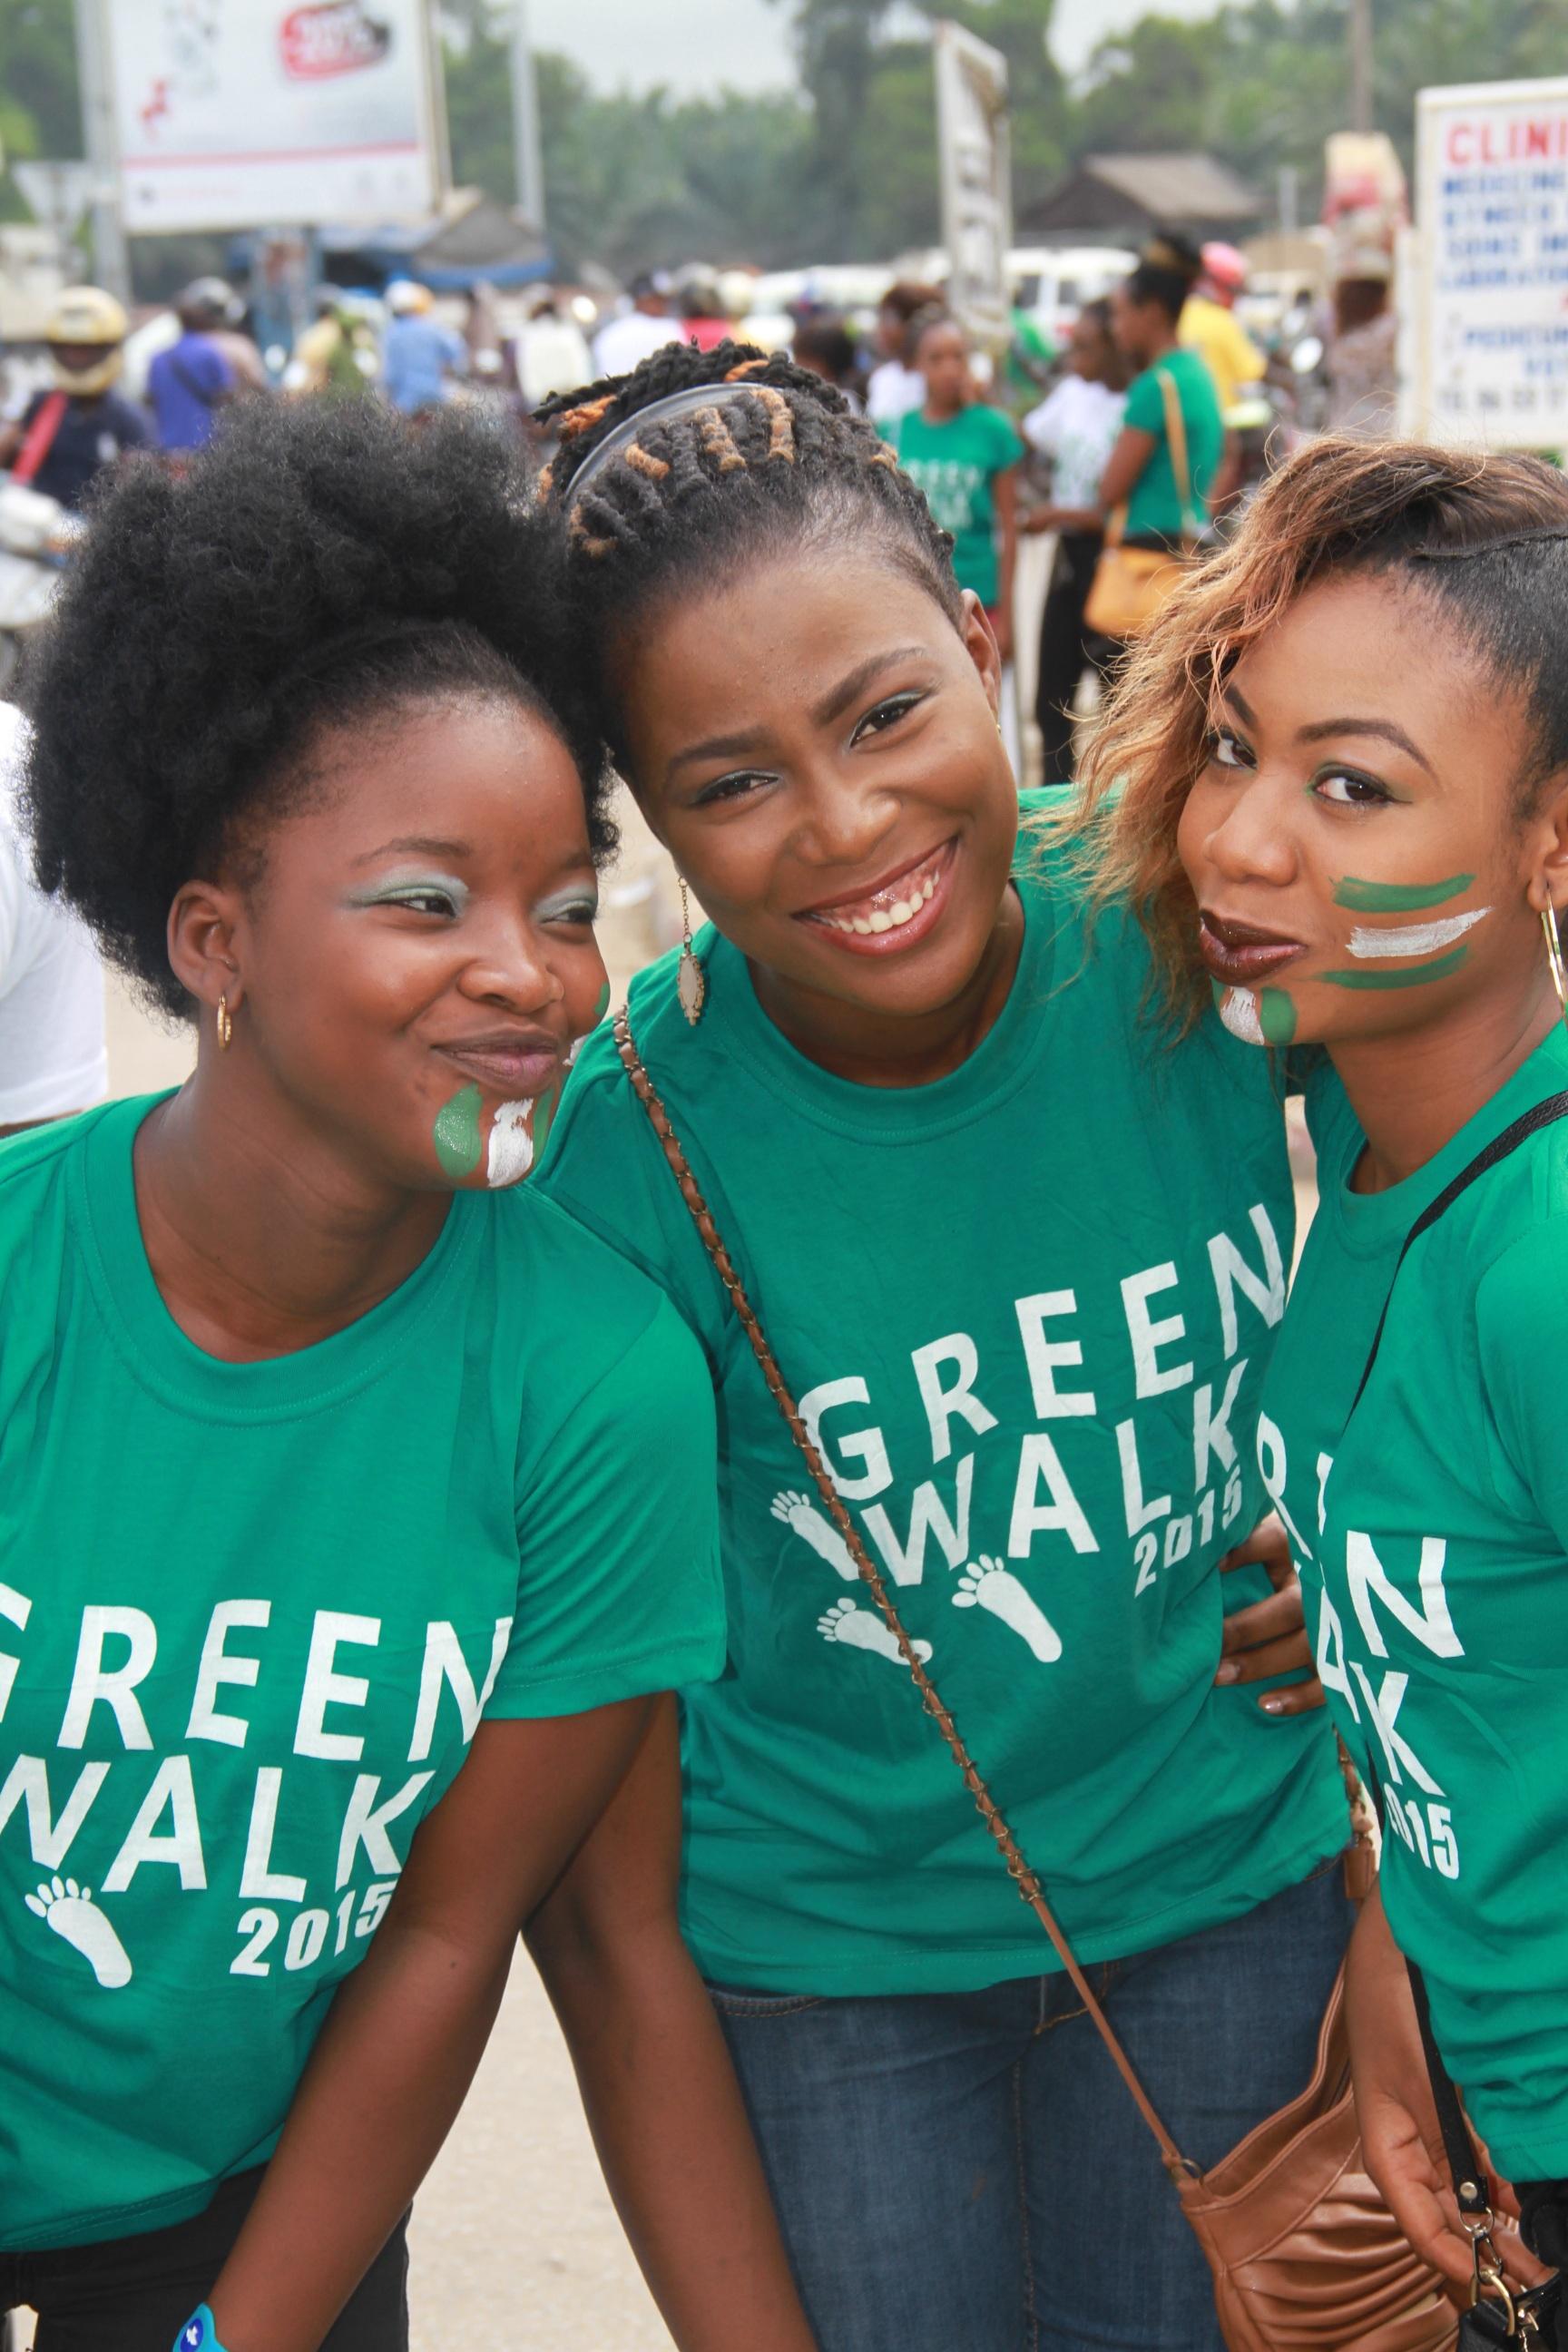 Нигерийцы девушки